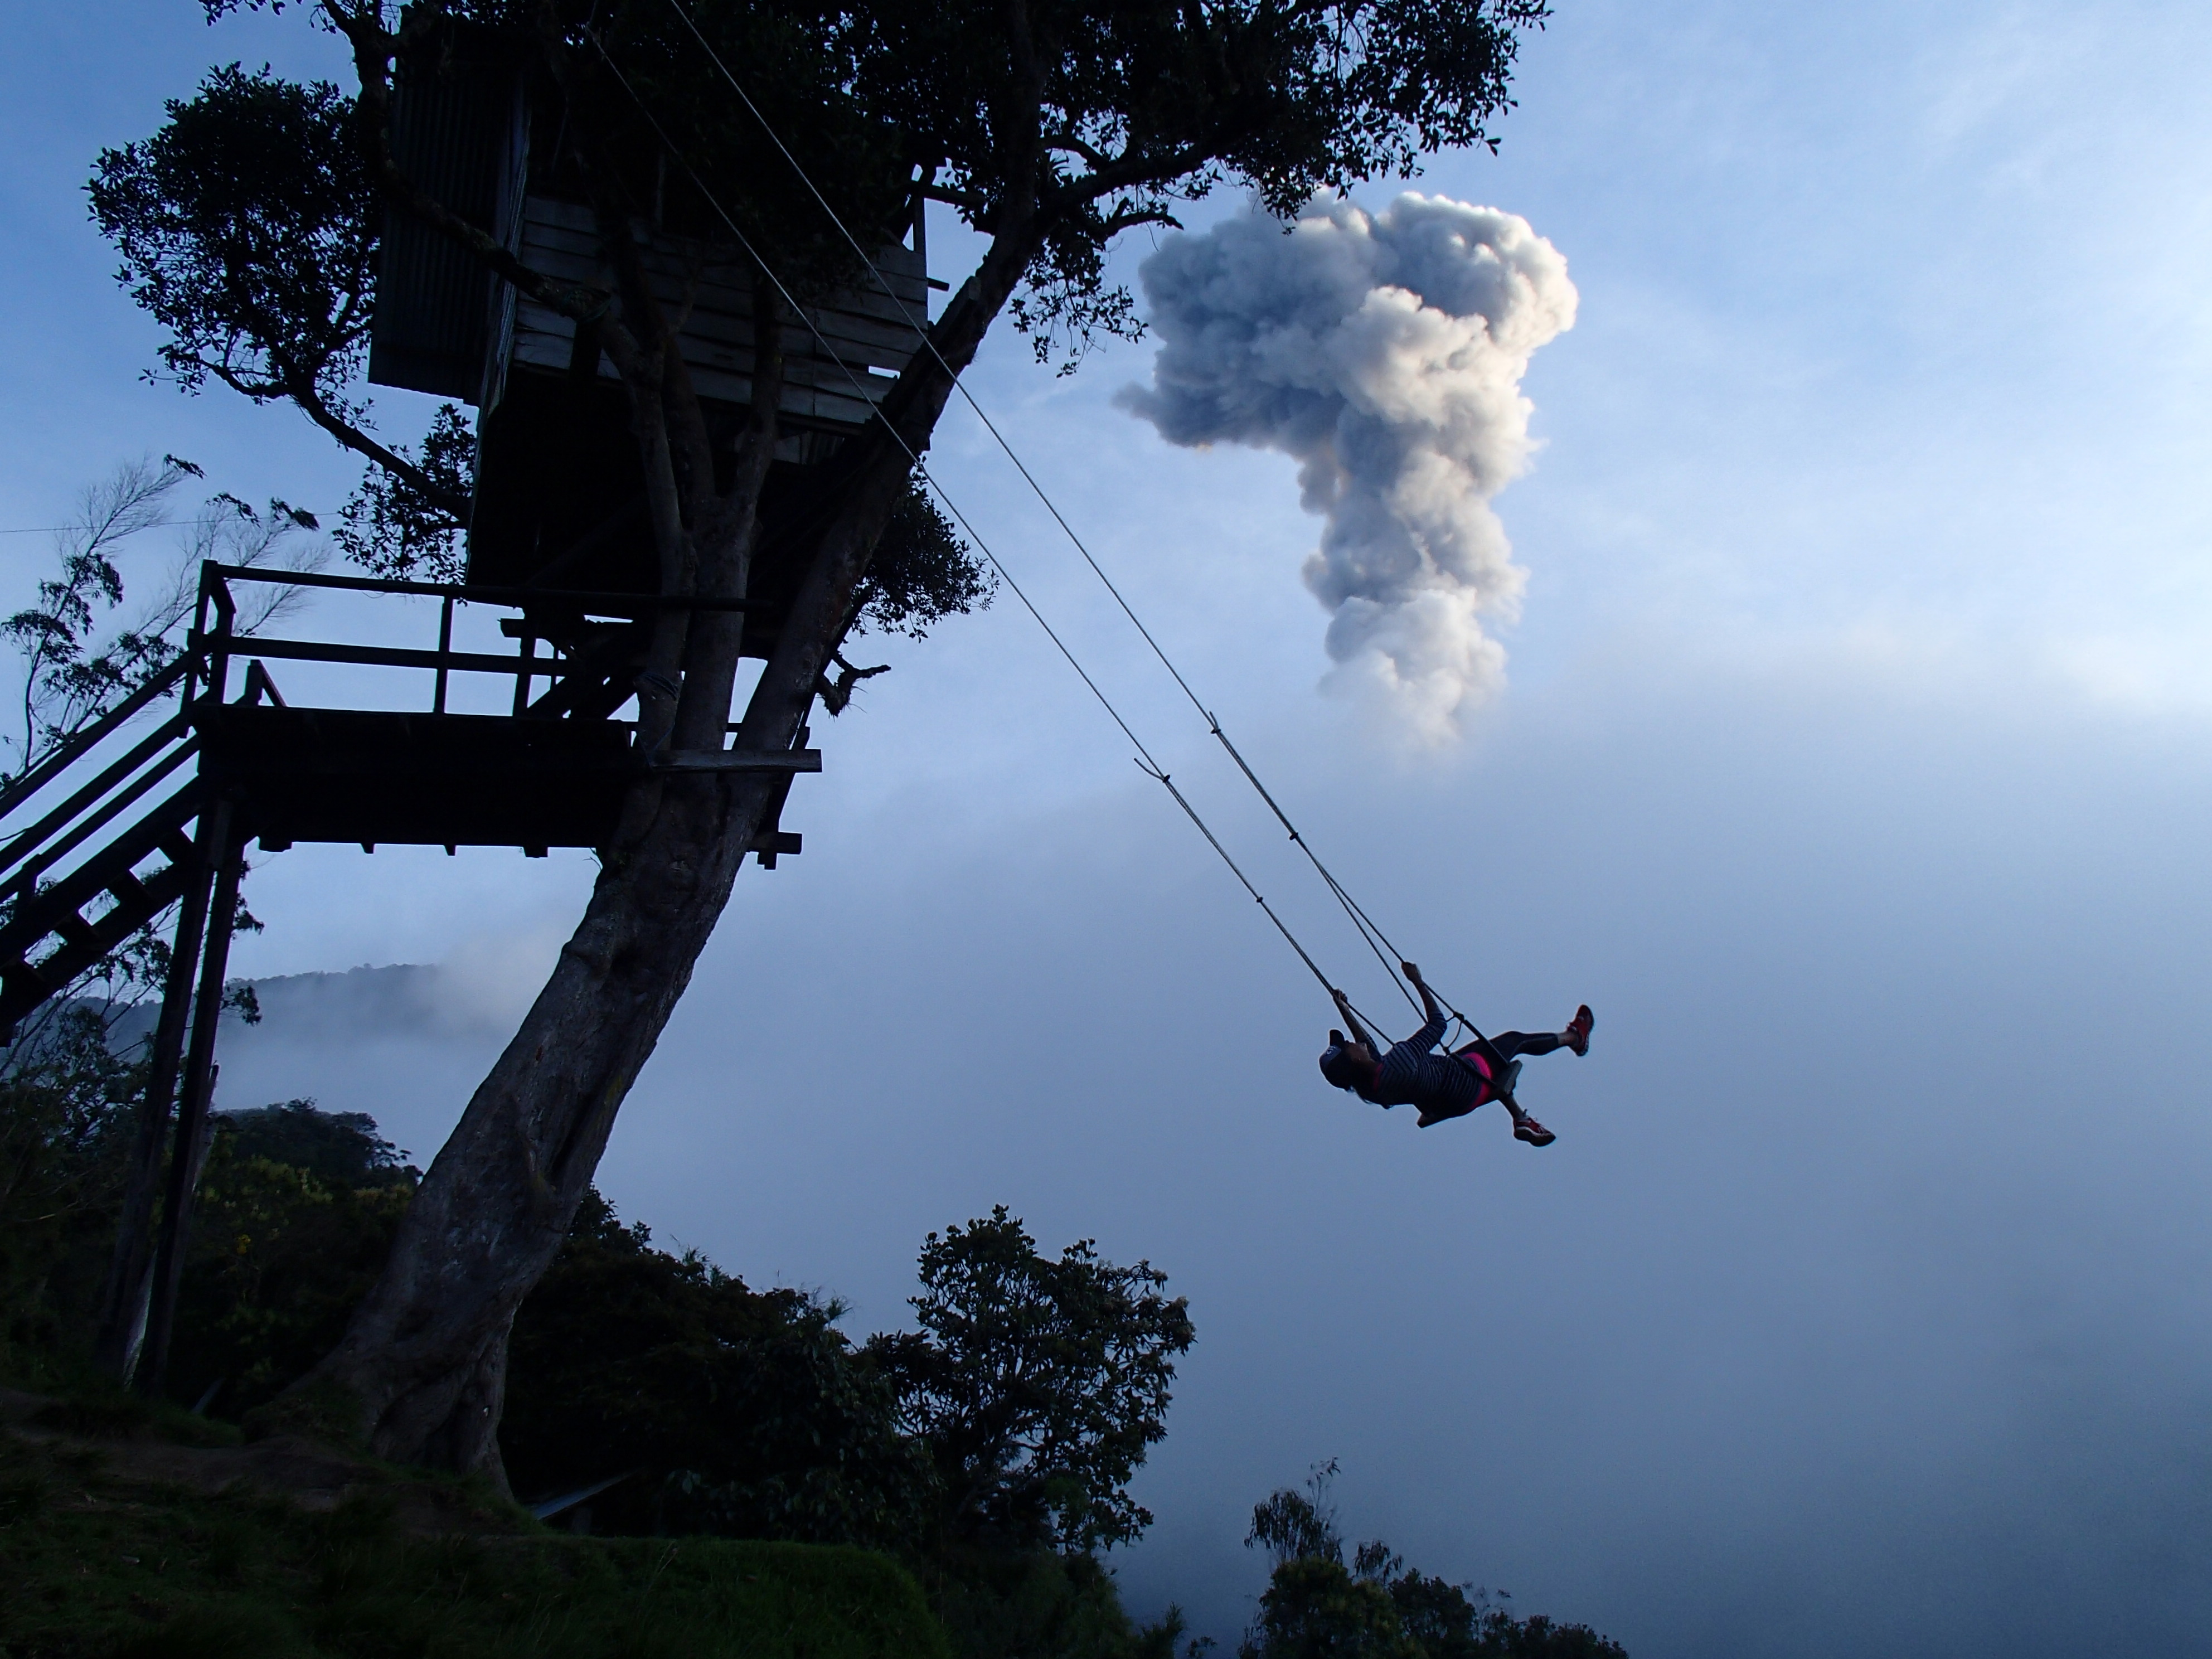 Equateur - Nomad Junkies